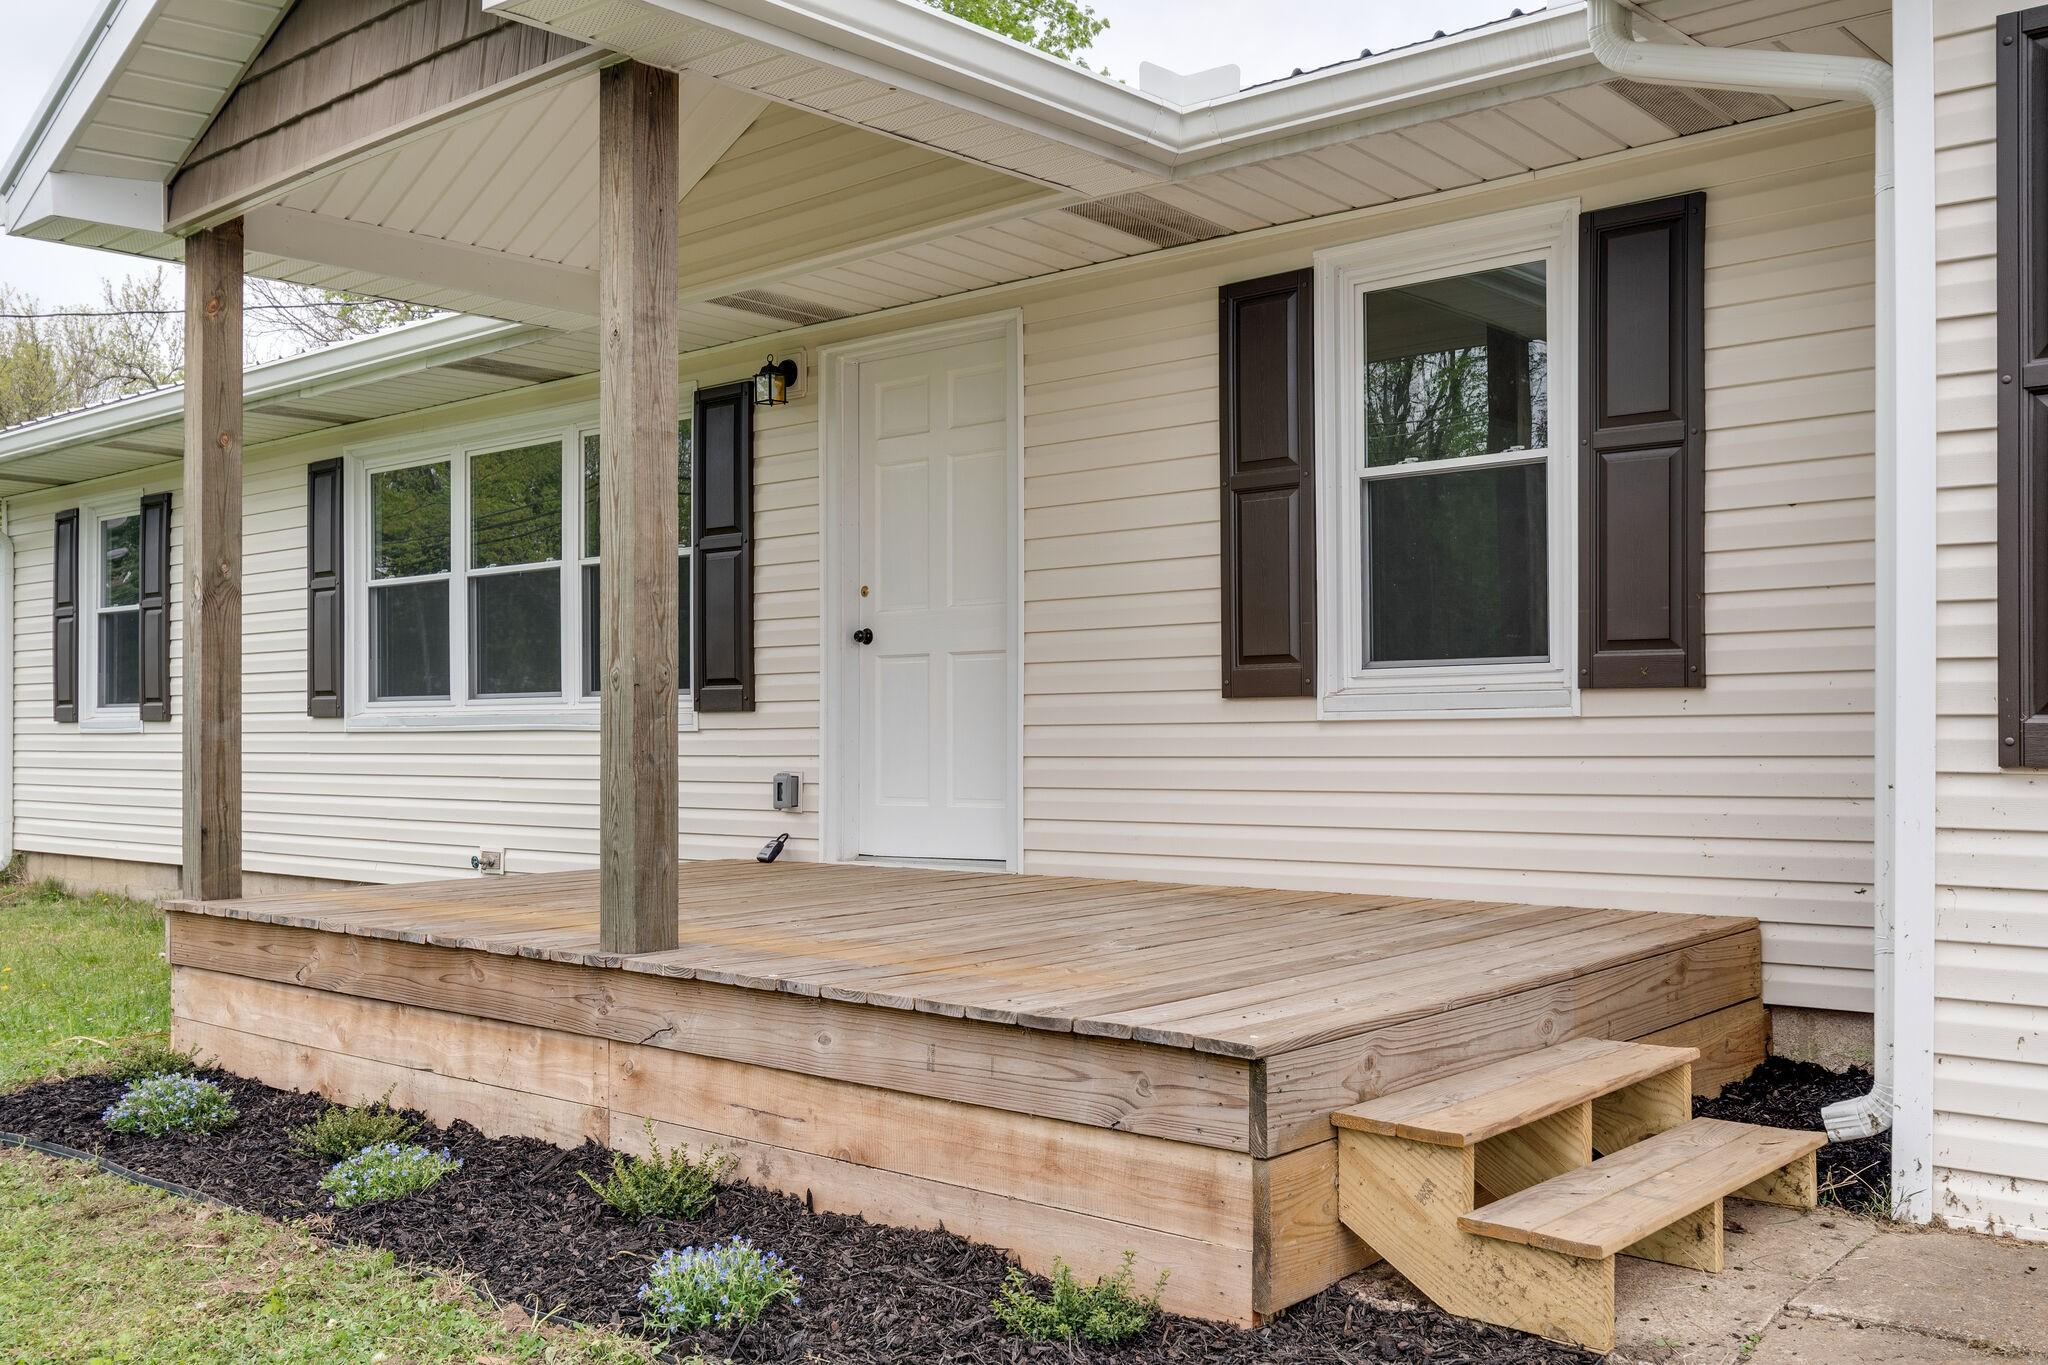 70 Main St Property Photo - Ethridge, TN real estate listing